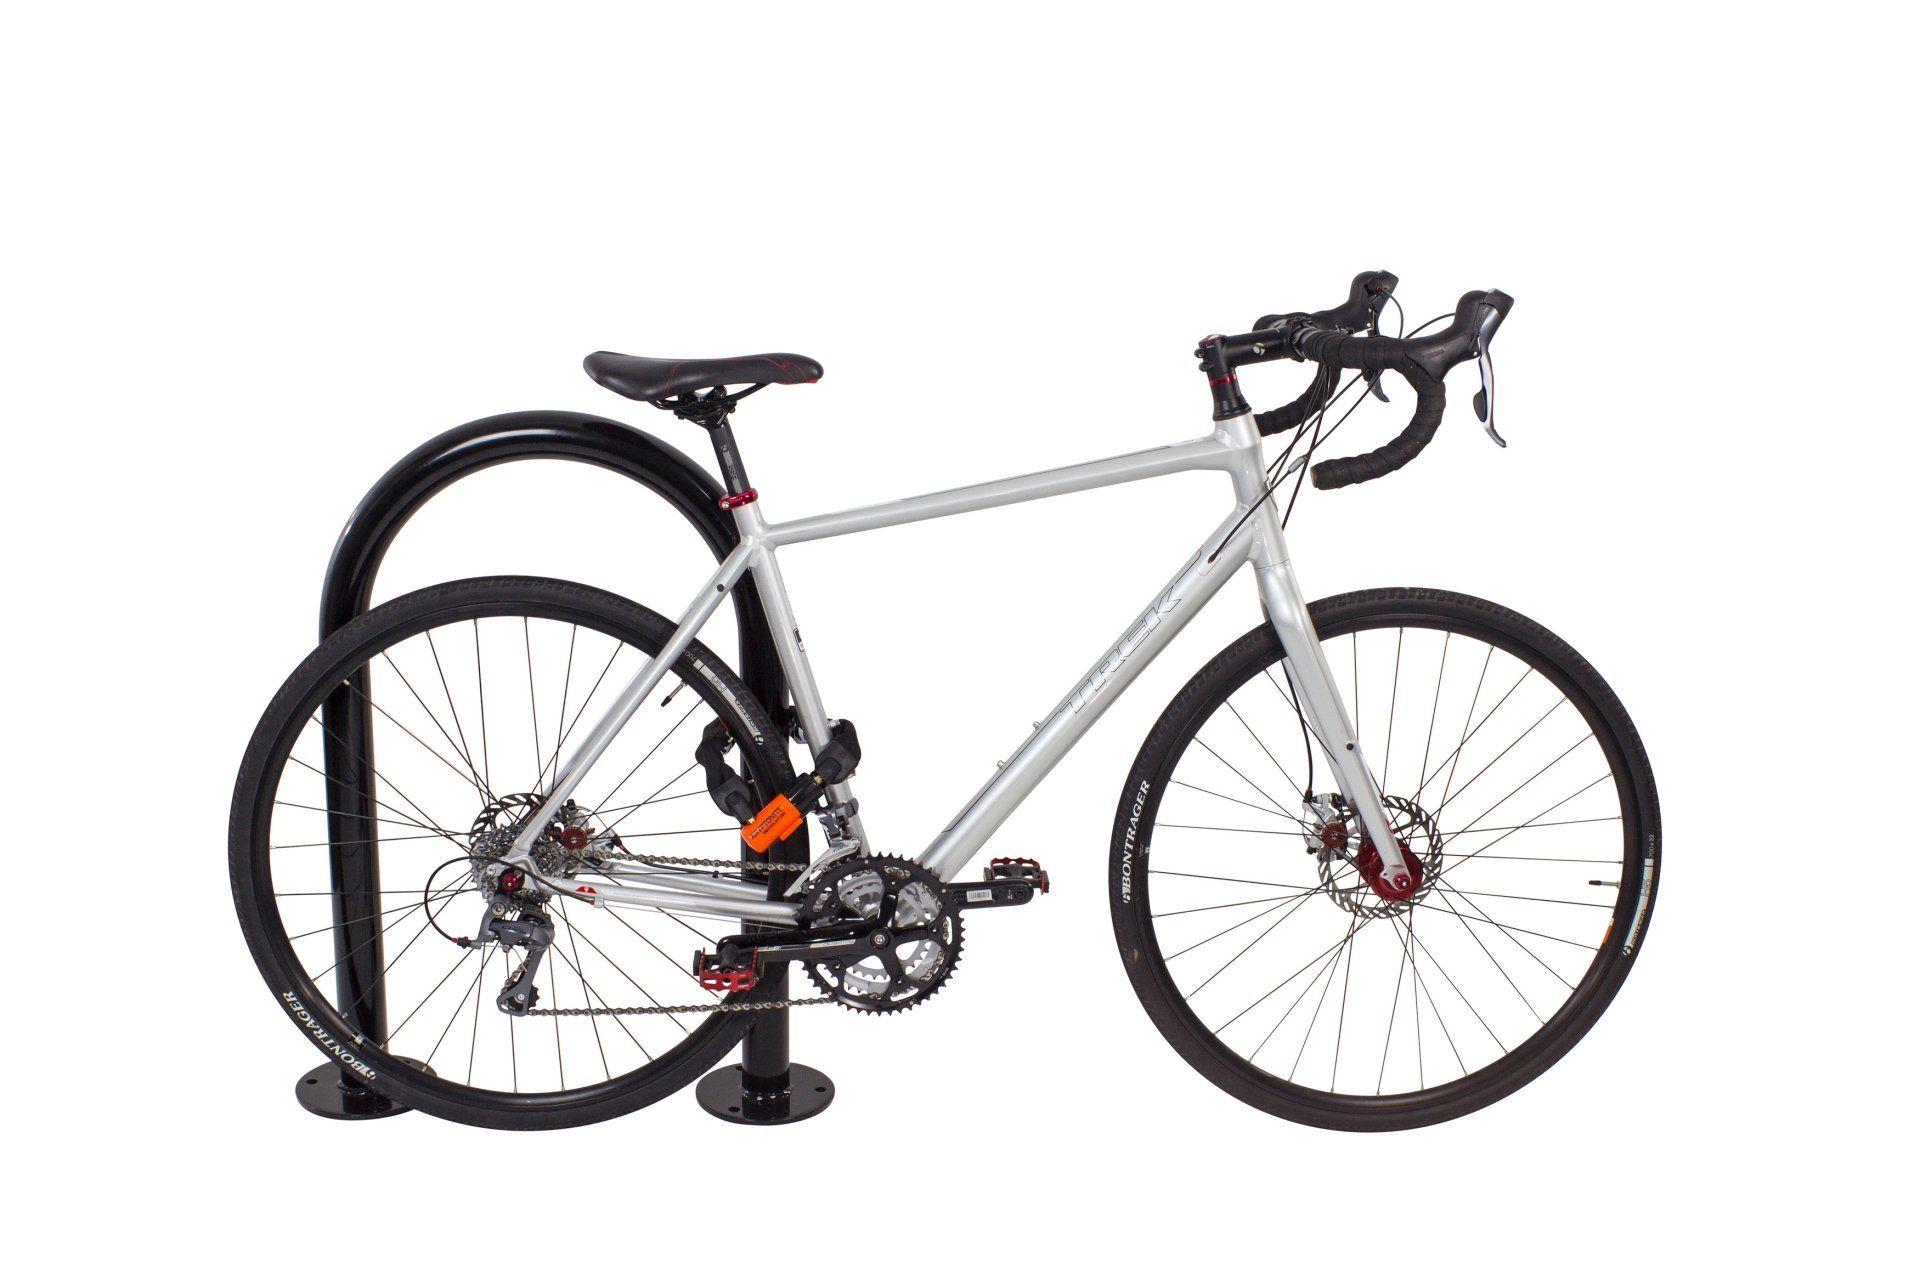 Kryptonite New York Chain 1217 Bicycle Lock With Evolution Series4